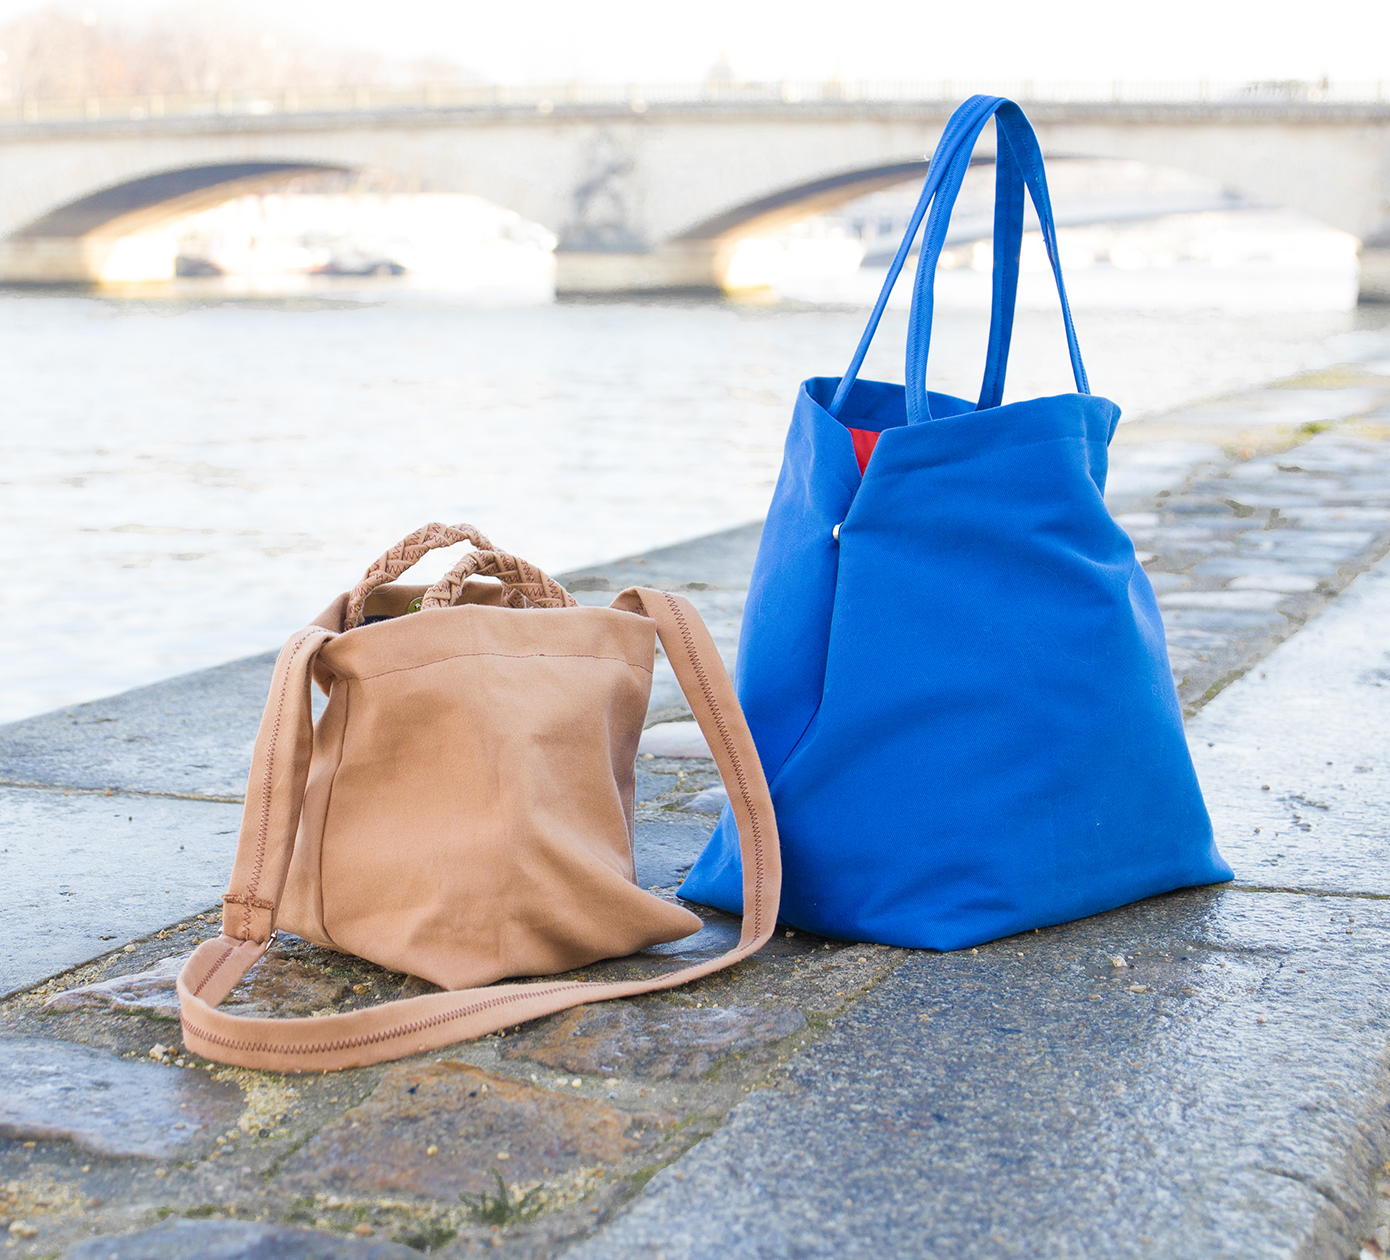 Sac Camille, 2 tailles de sac